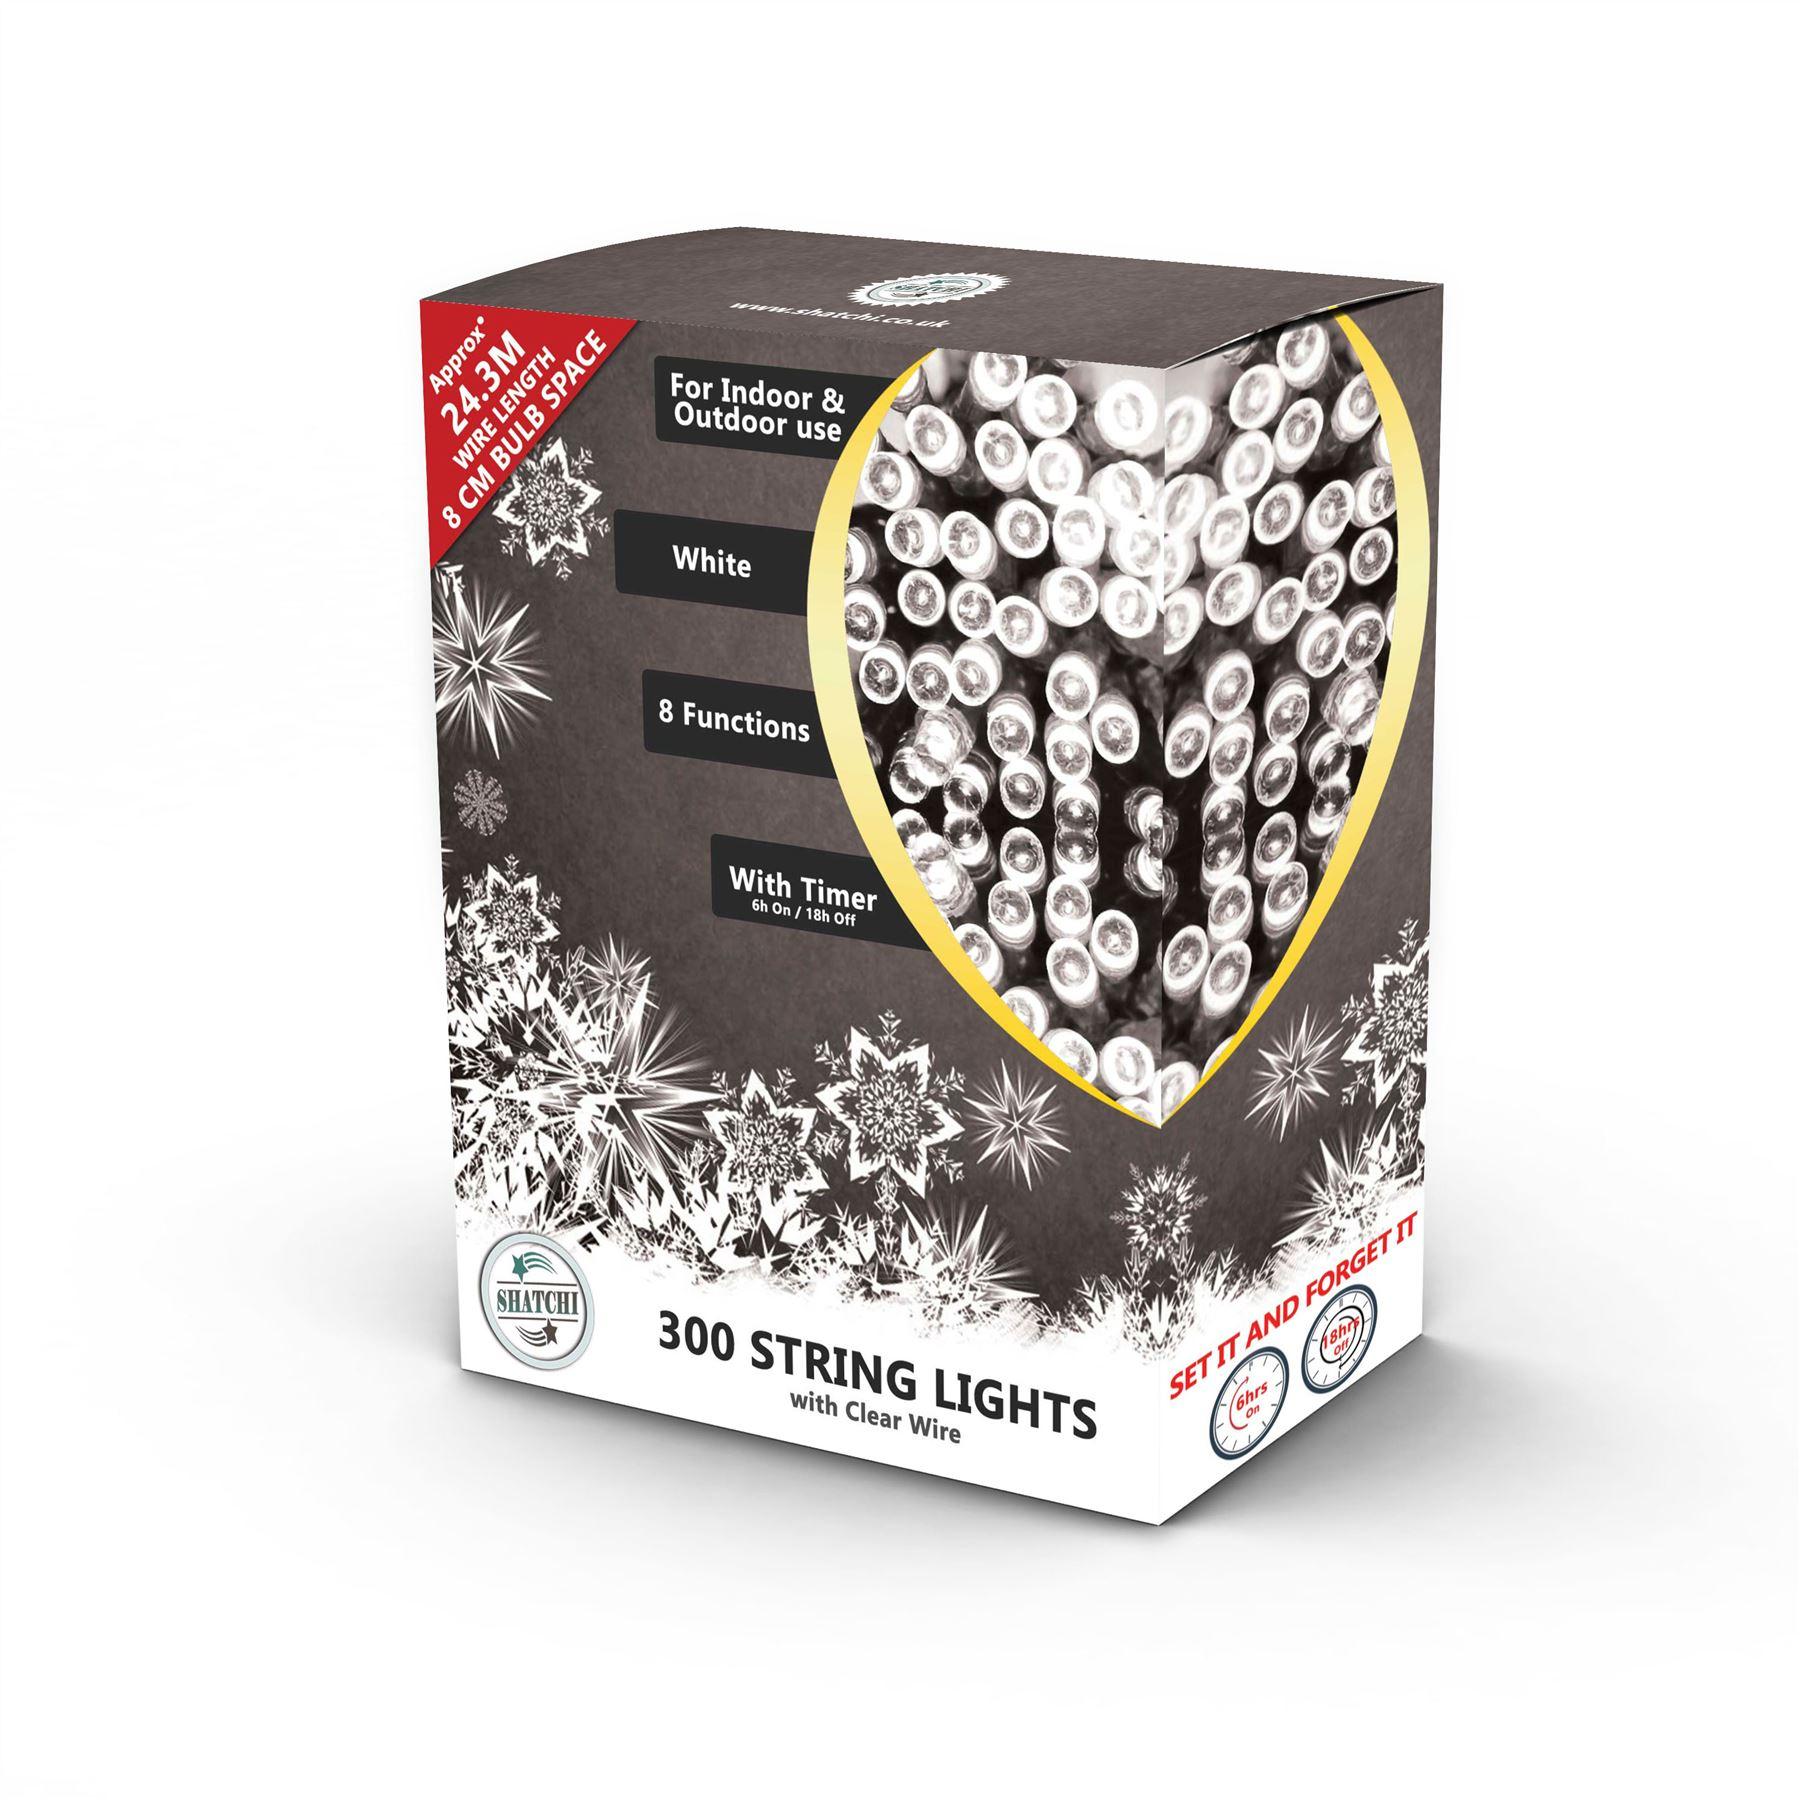 100-200-300-400-500-LED-Christmas-String-Fairy-Lights-Xmas-Decorations-Tree miniature 20